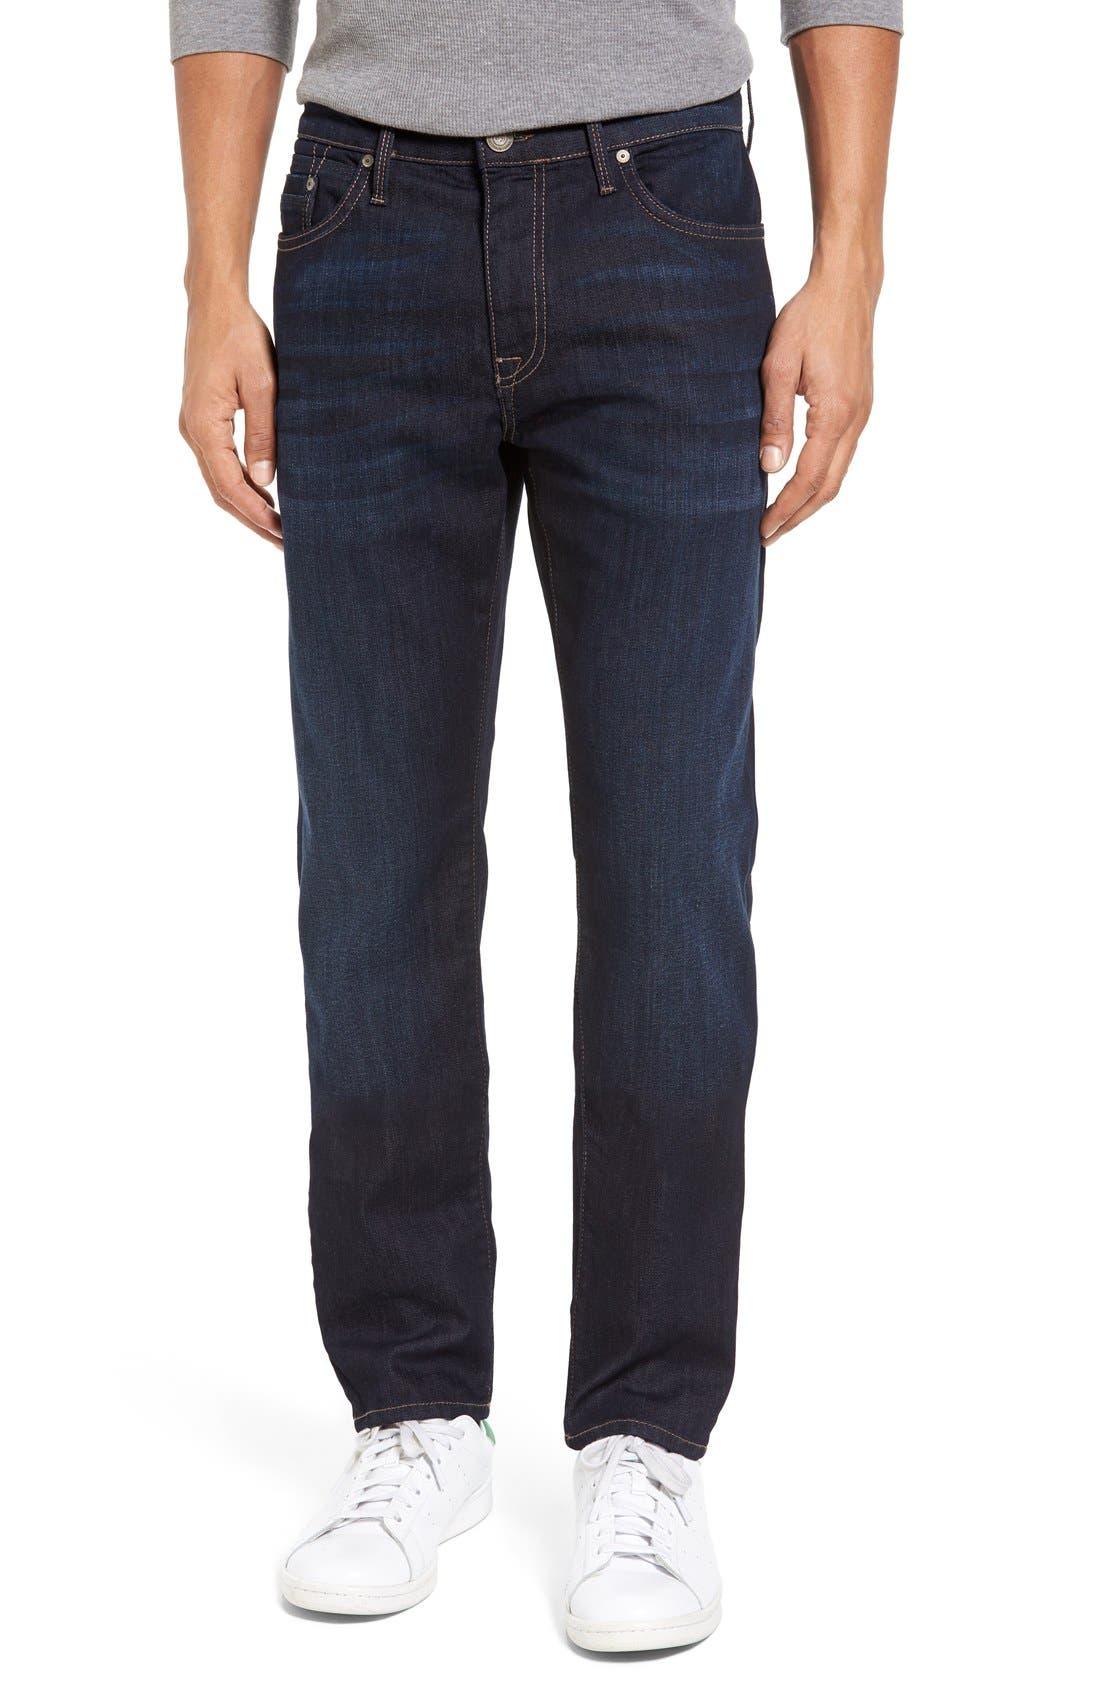 Marcus Slim Straight Leg Jeans,                         Main,                         color, Rinse Brushed Williamsburg